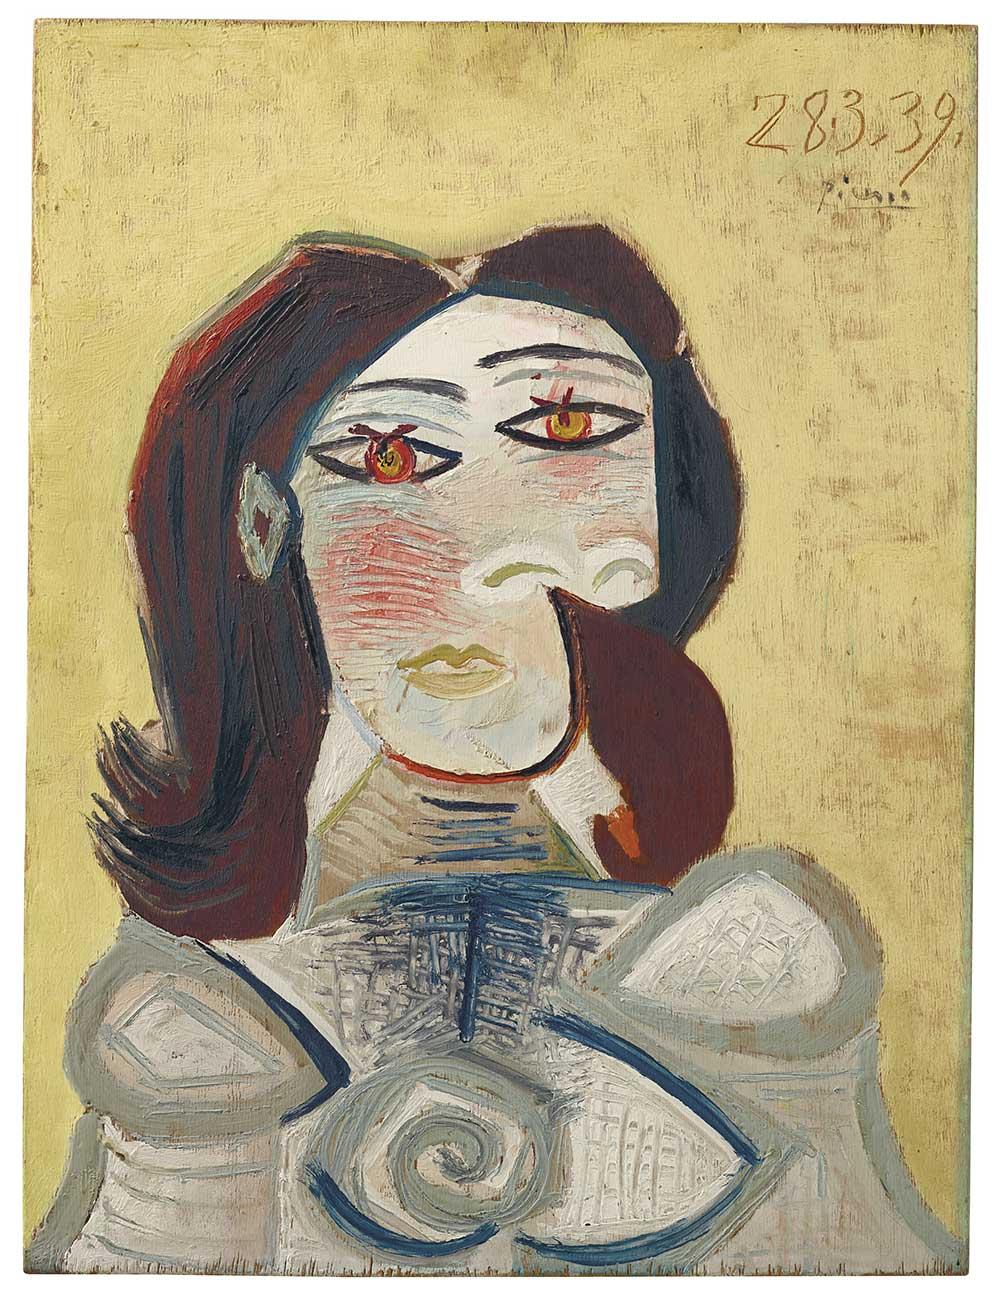 Pablo Picasso,《Buste de femme (Dora Maar)》,28 March 1939。預估價500-800萬美元。圖/佳士得提供。